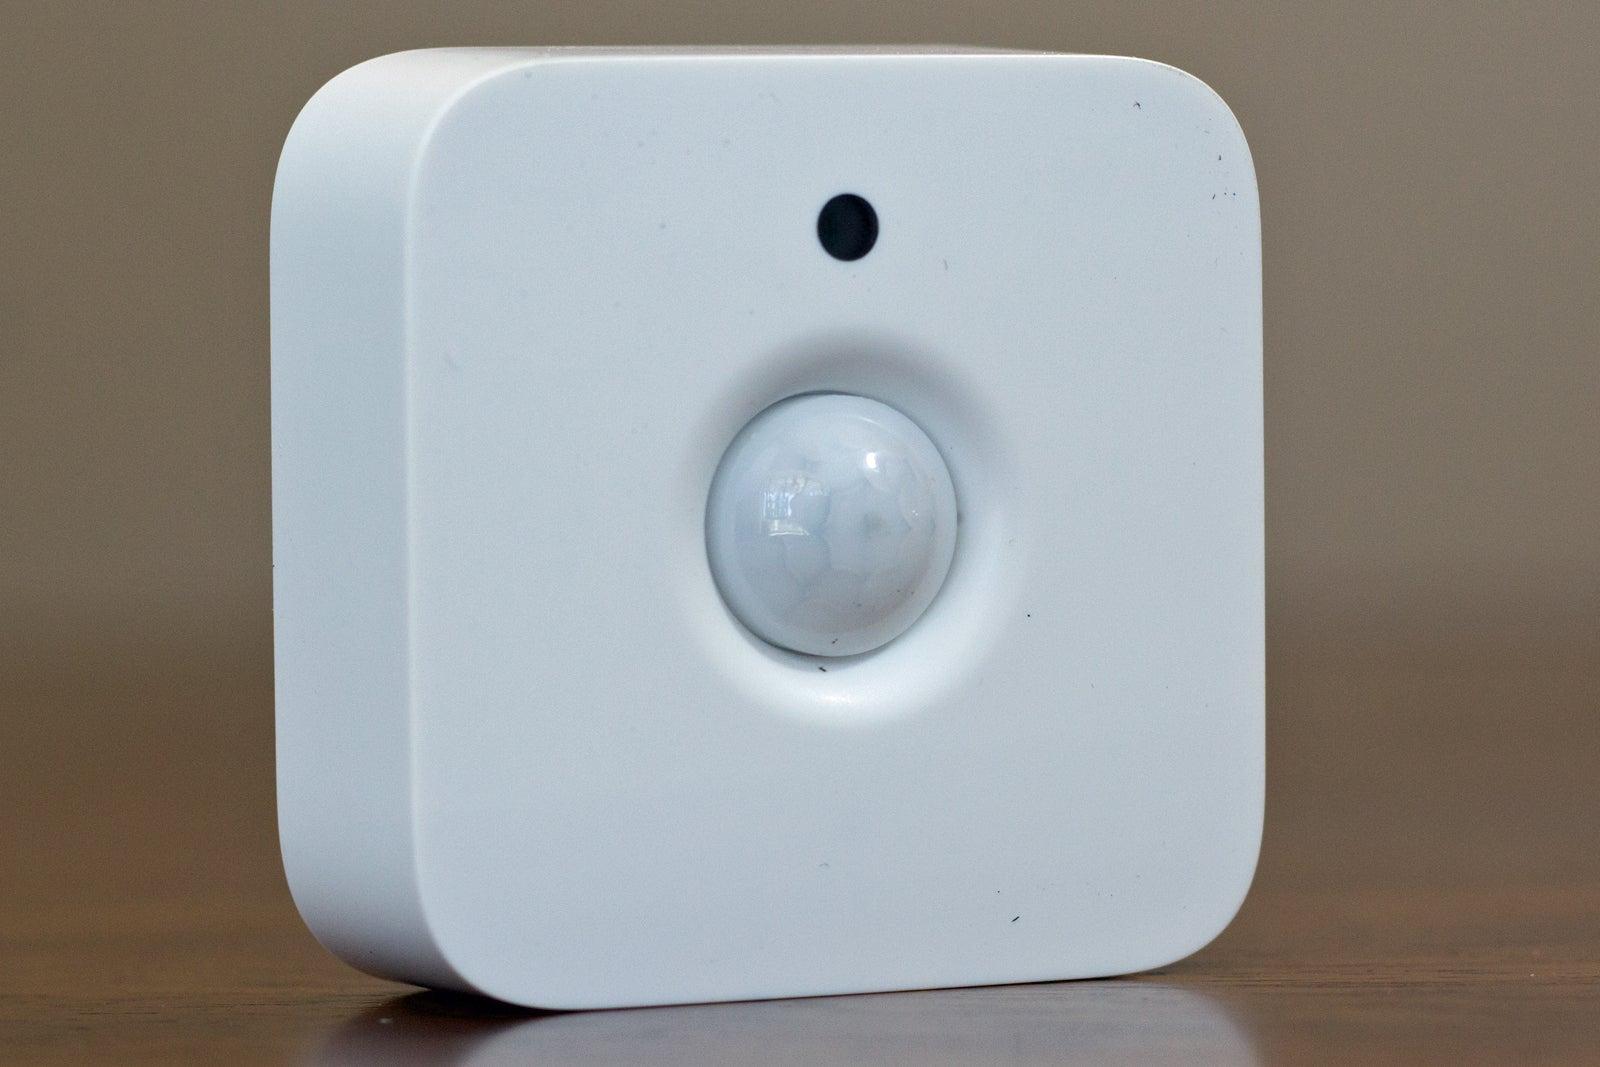 Philips Hue And Sylvania Lightify Motion Sensor Reviews